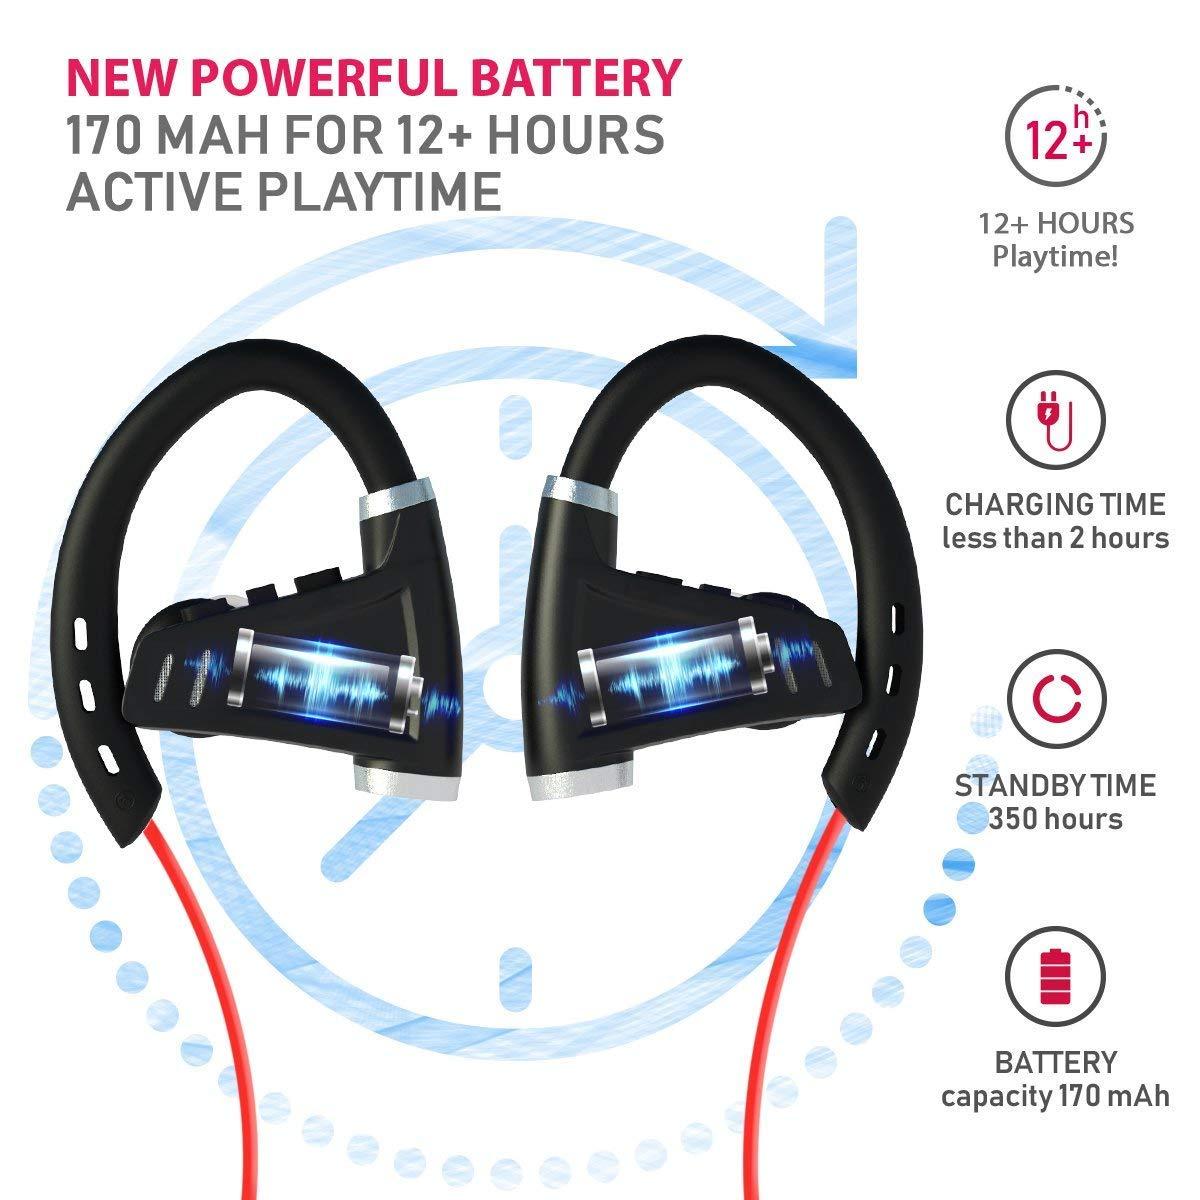 Upgraded 2020 Sport Bluetooth Headphones w 12 Hours Battery – Professional Wireless Sport Earphones w Mic – IPX7 Waterproof Deep Bass Music in-Ear Earbuds for Gym Running Workout for Men, Women